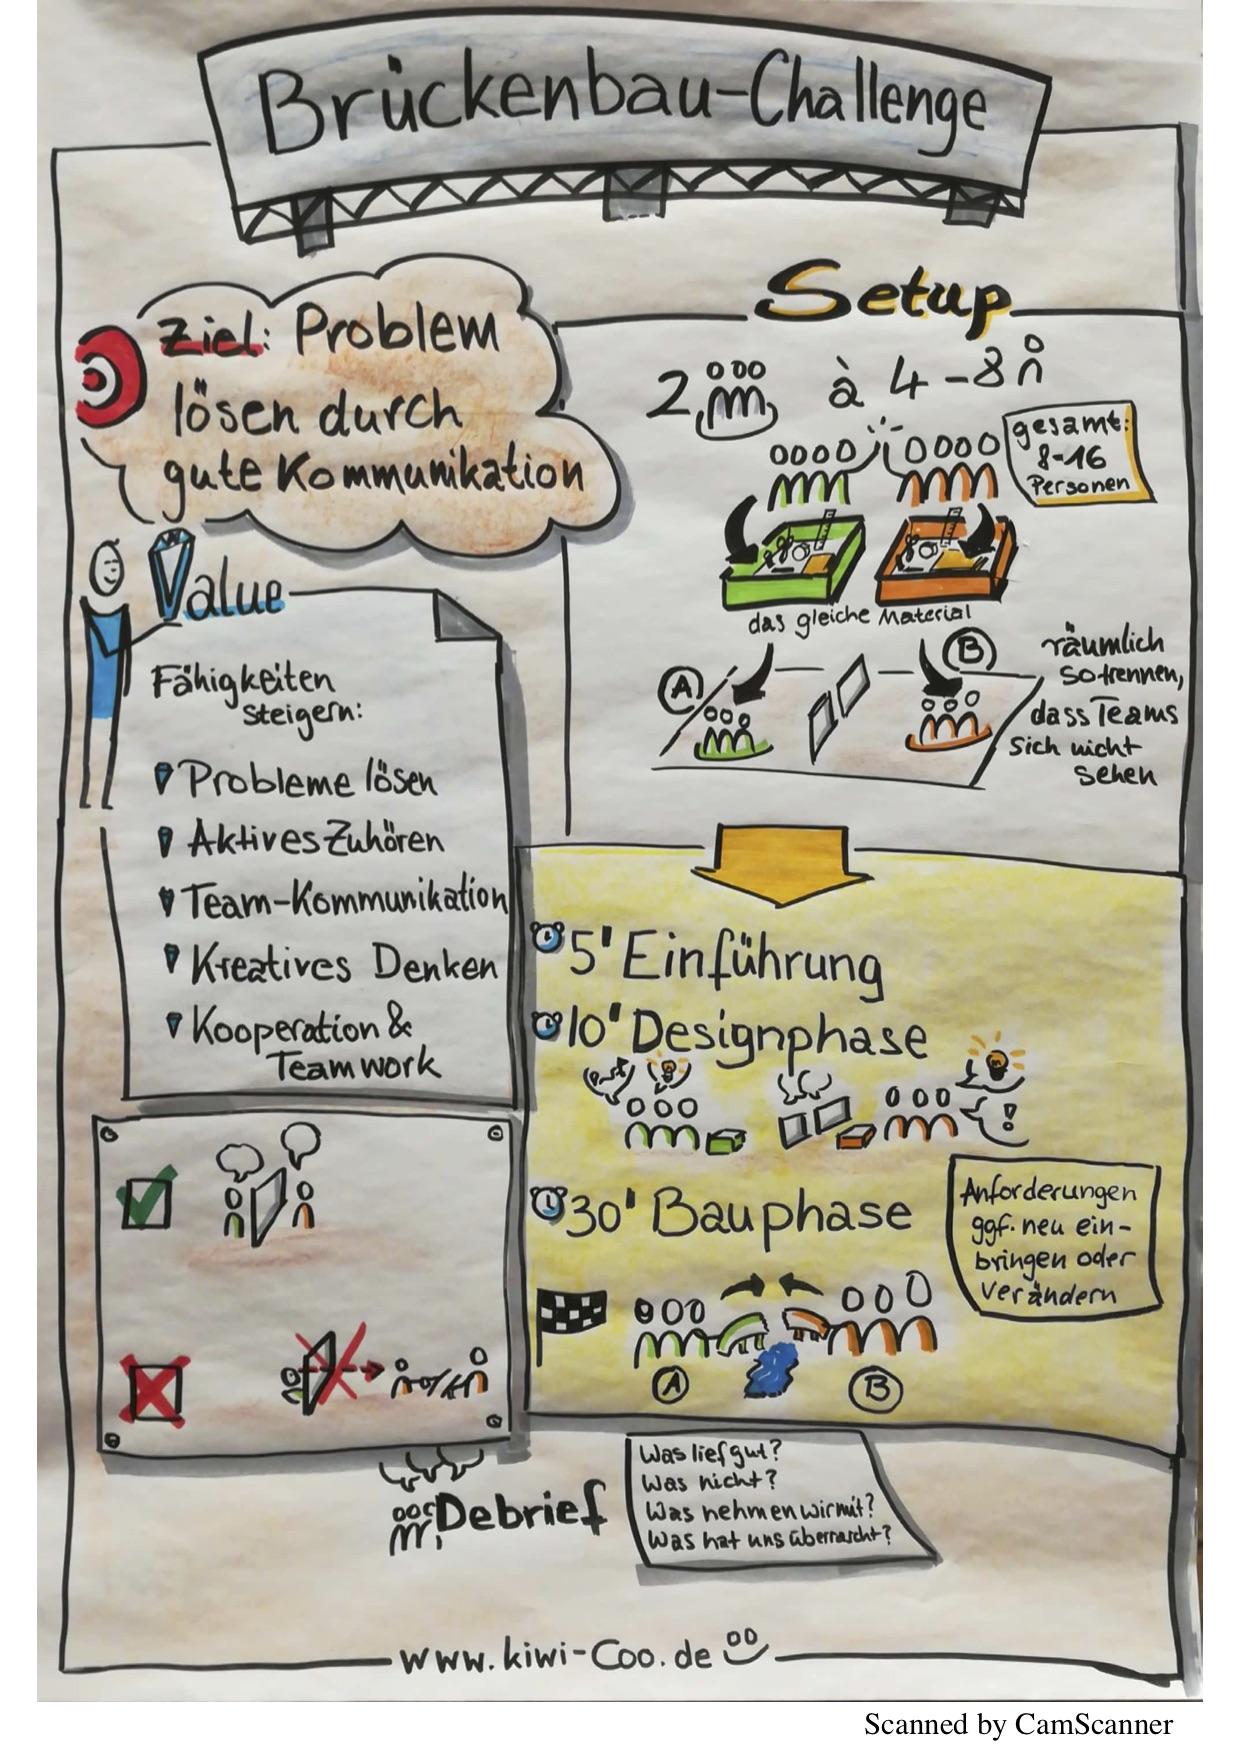 Agile Spiele brückenbau-challenge – agile business games